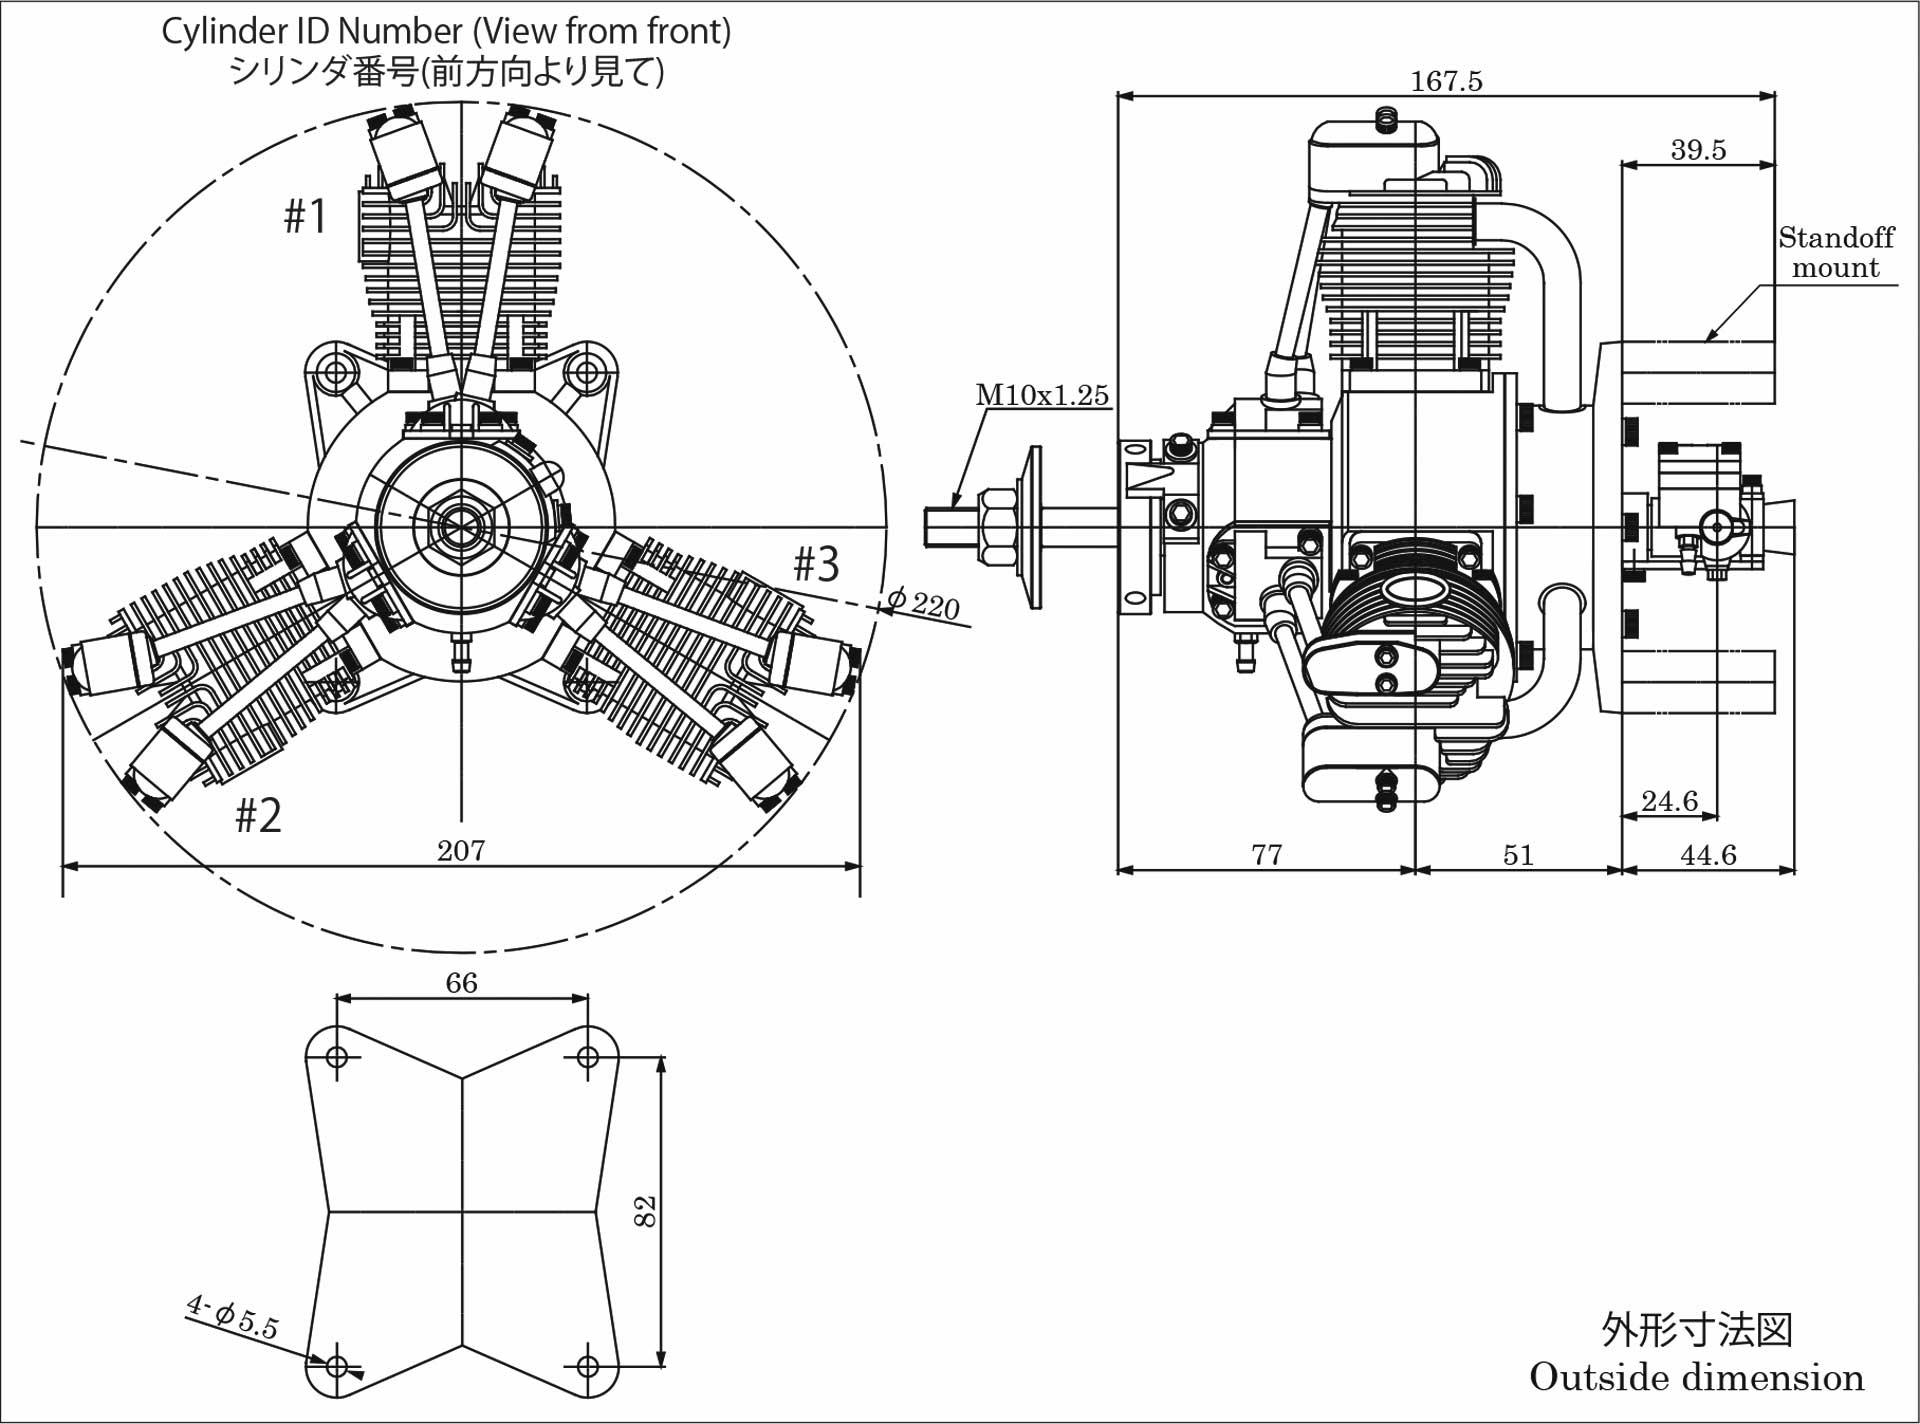 SAITO FG-60R3 BENZIN STERNMOTOR 3 ZYLINDER